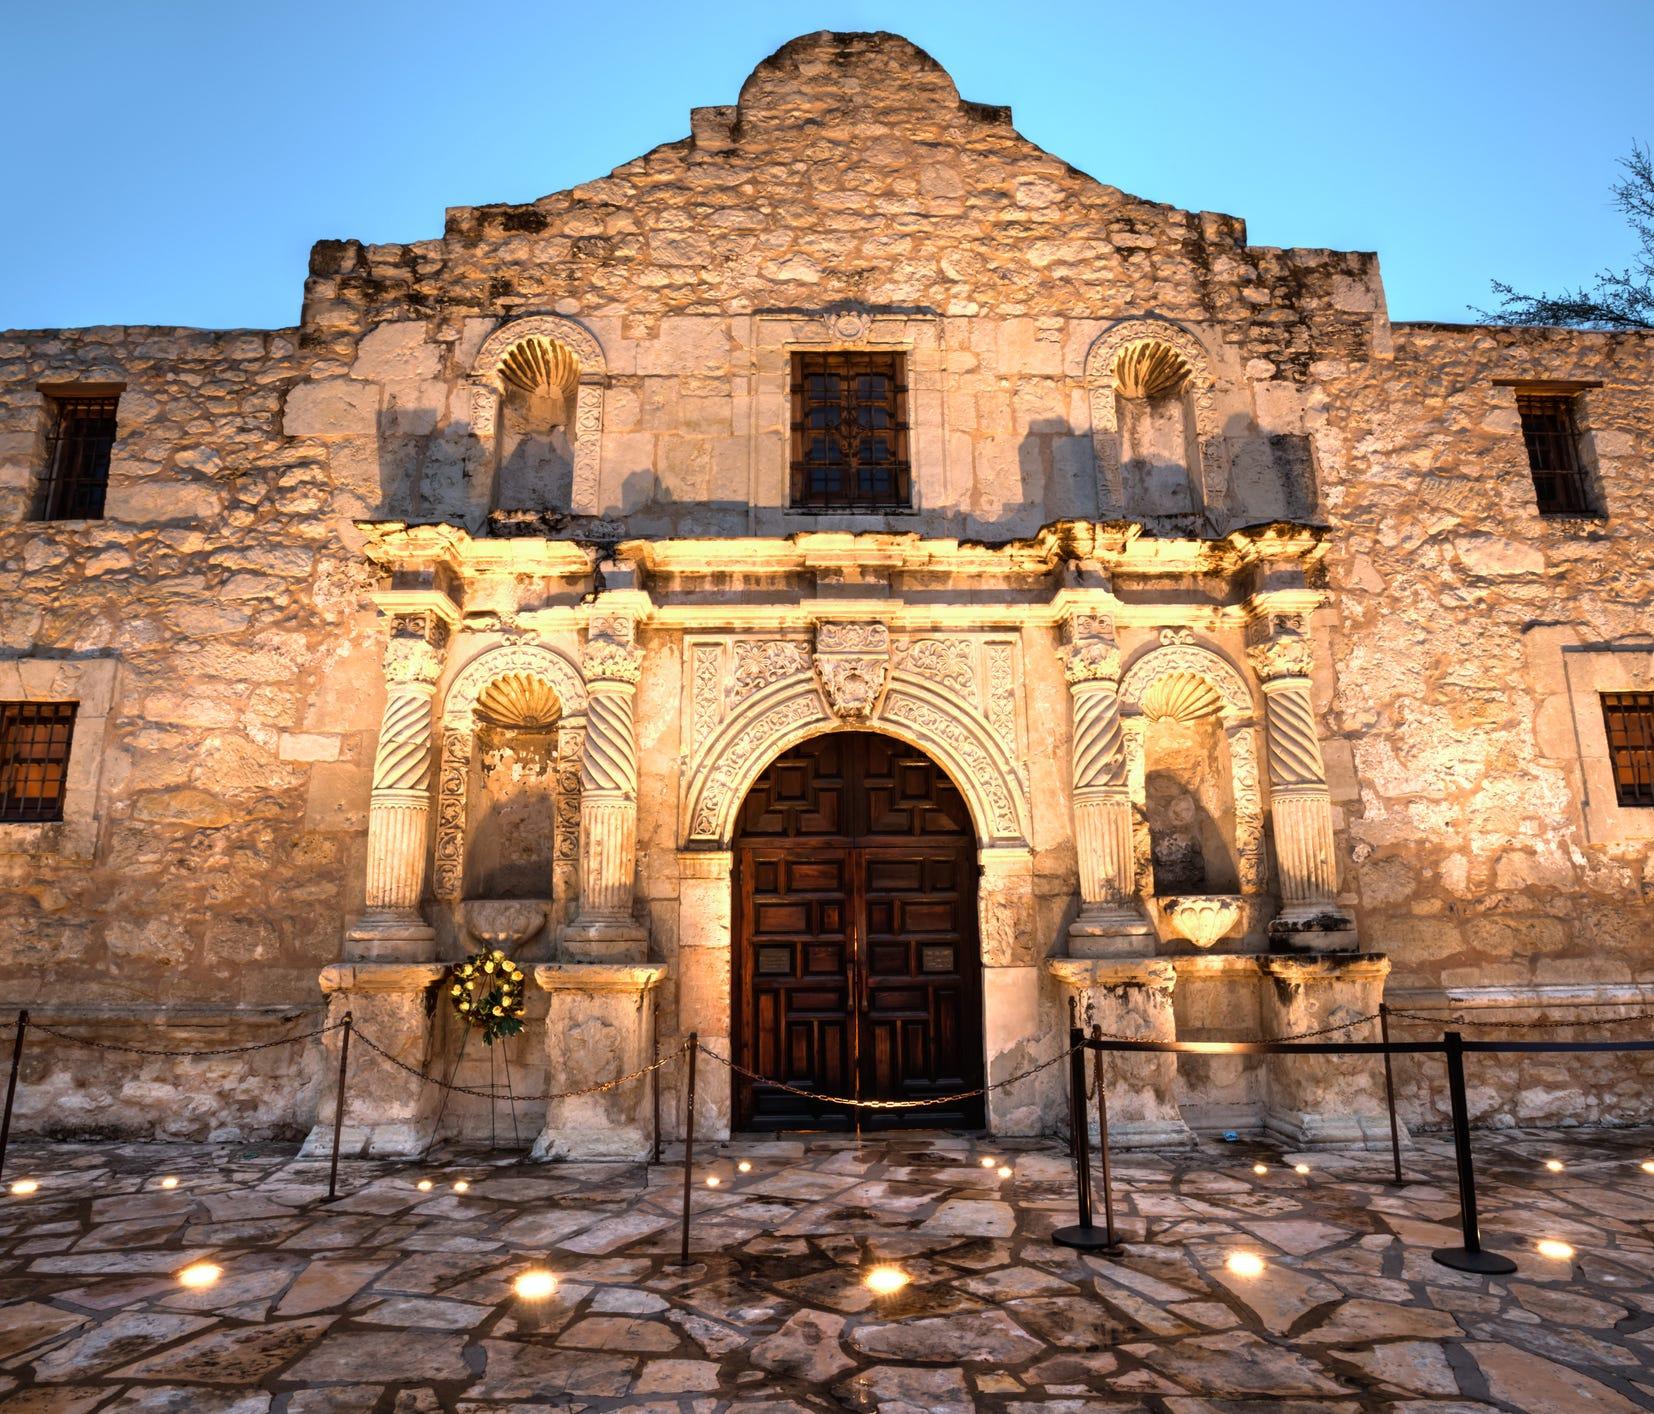 The Alamo Mission in San Antonio.